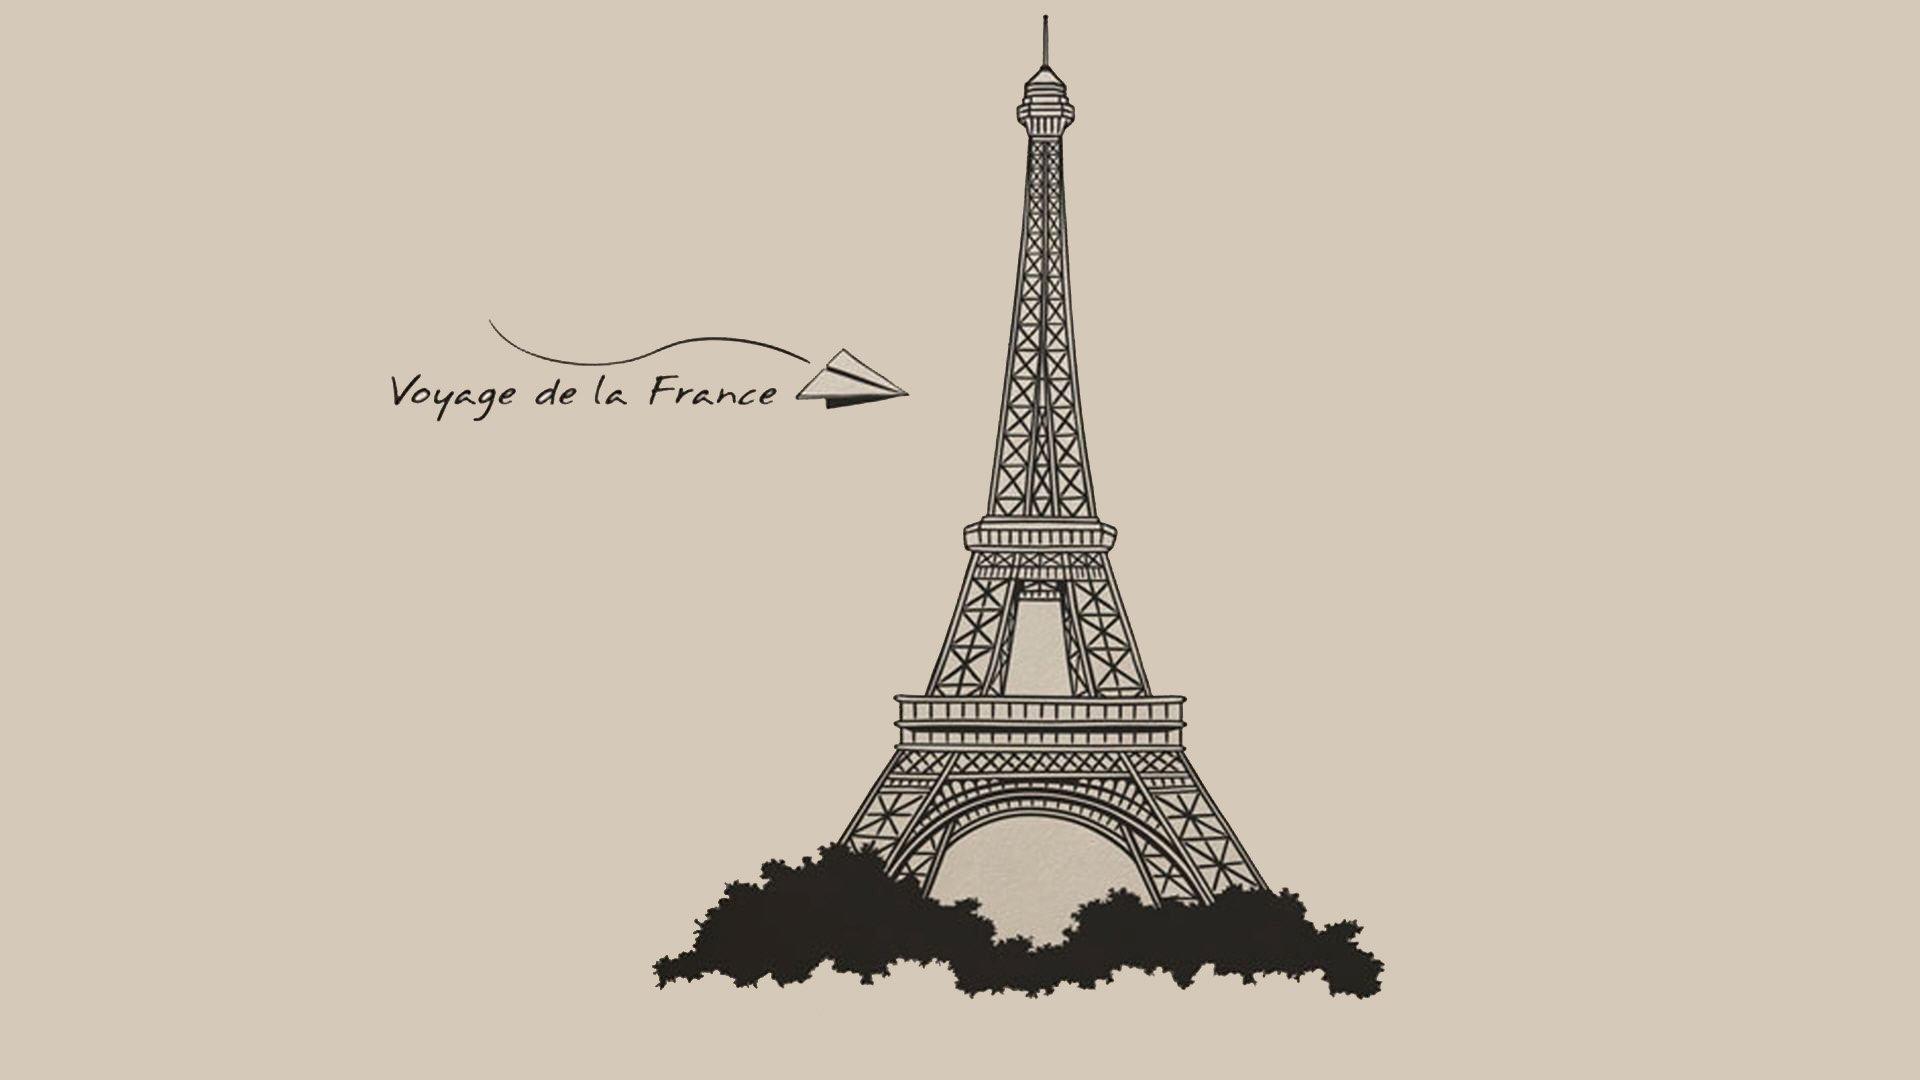 1920x1080 Paris Eiffel Tower Drawing Eiffel Tower Drawing Wallpapers